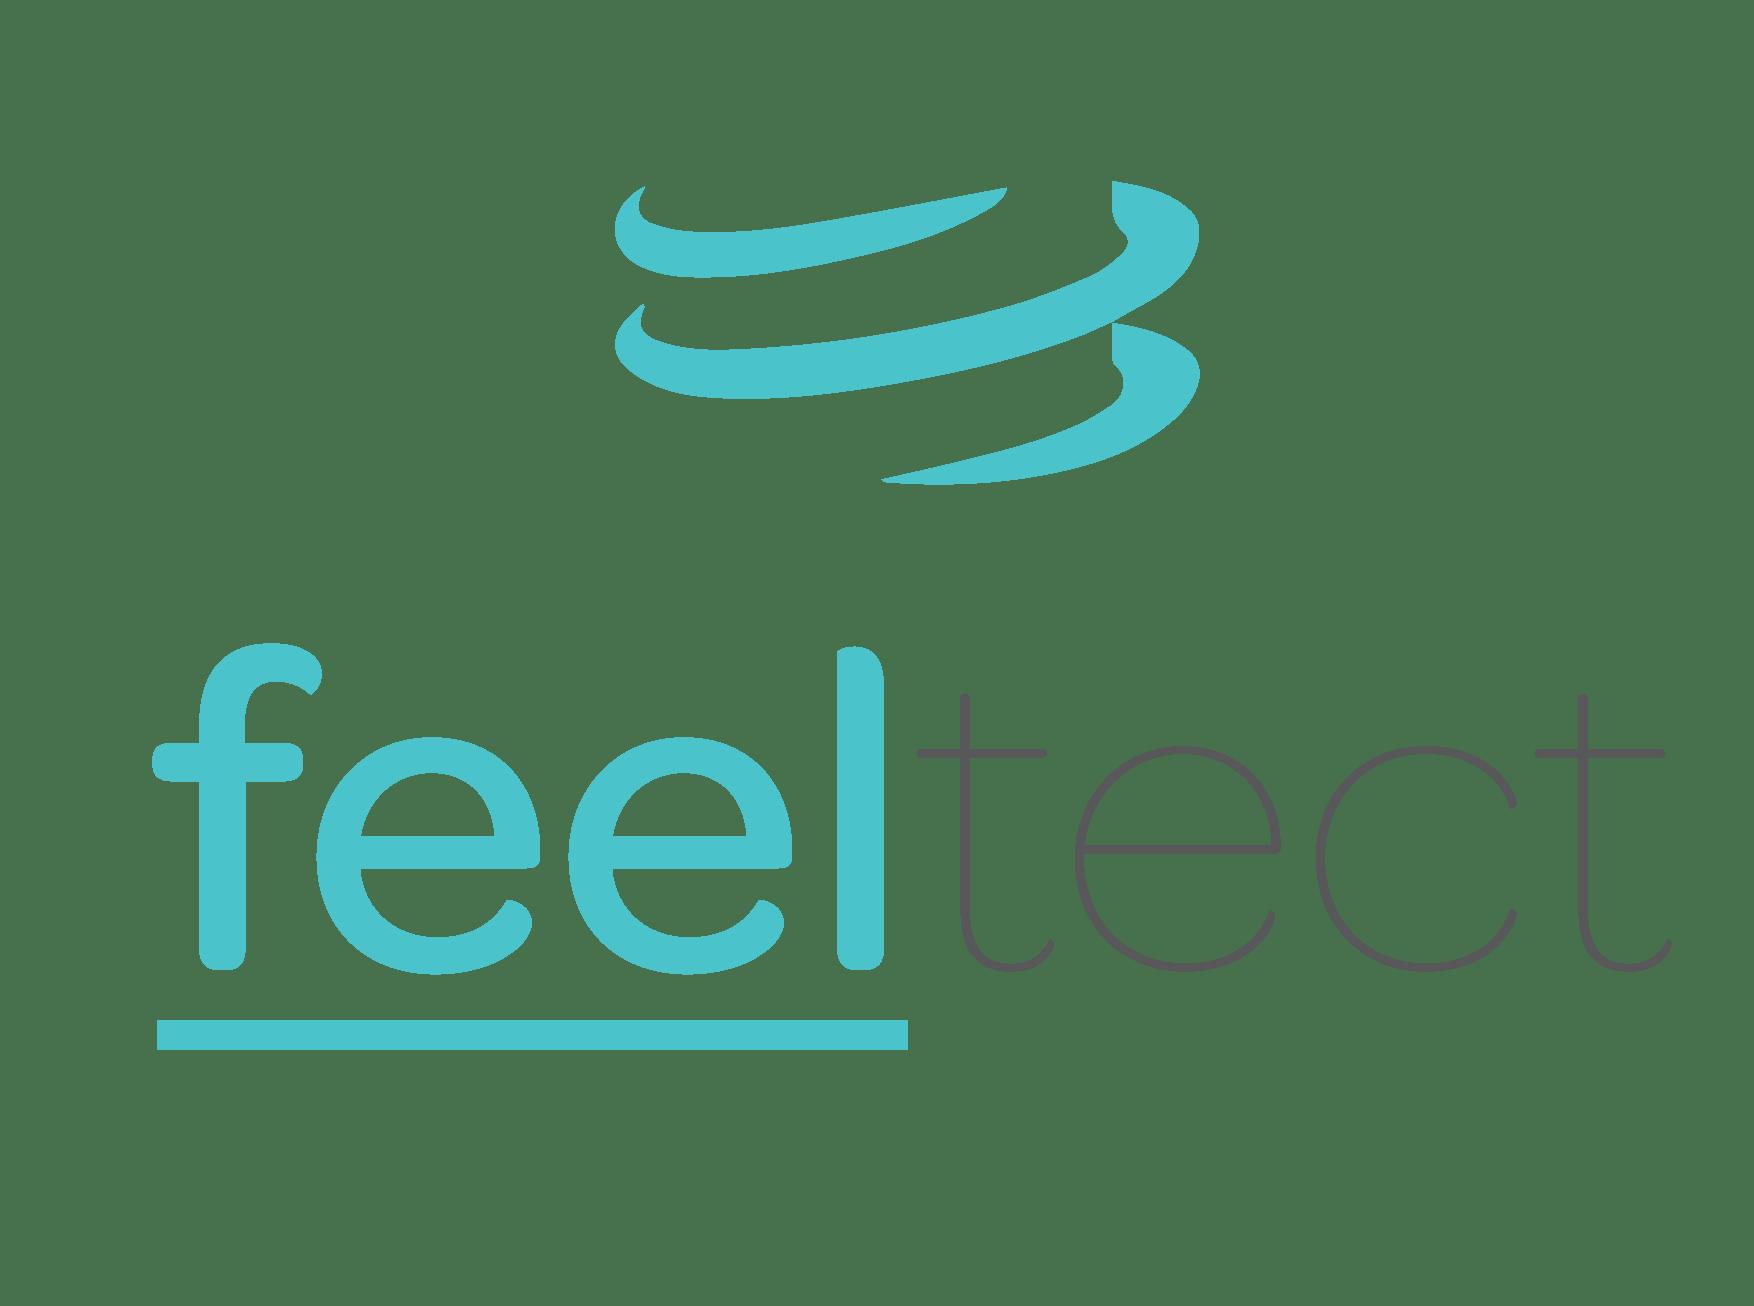 FeelTect